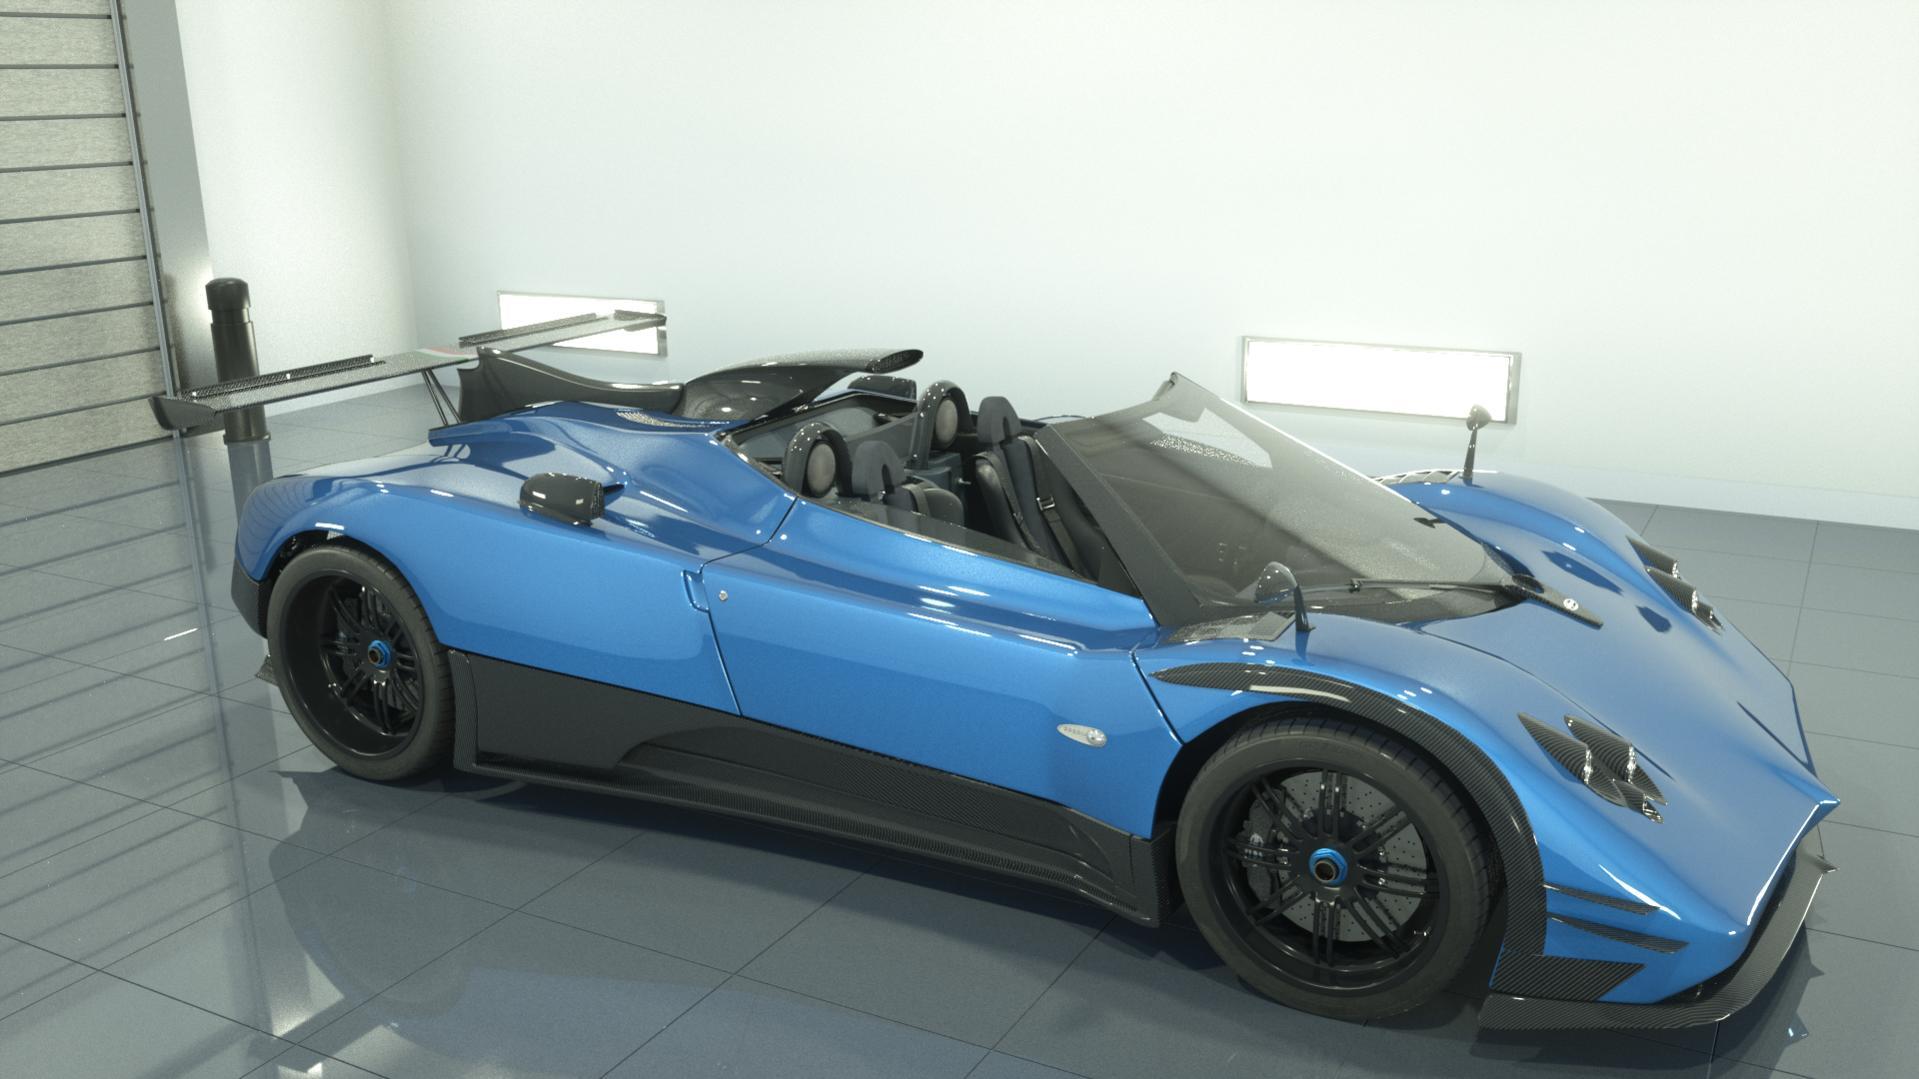 Pagani Zonda 760 Roadster - Works in Progress - Blender Artists ...